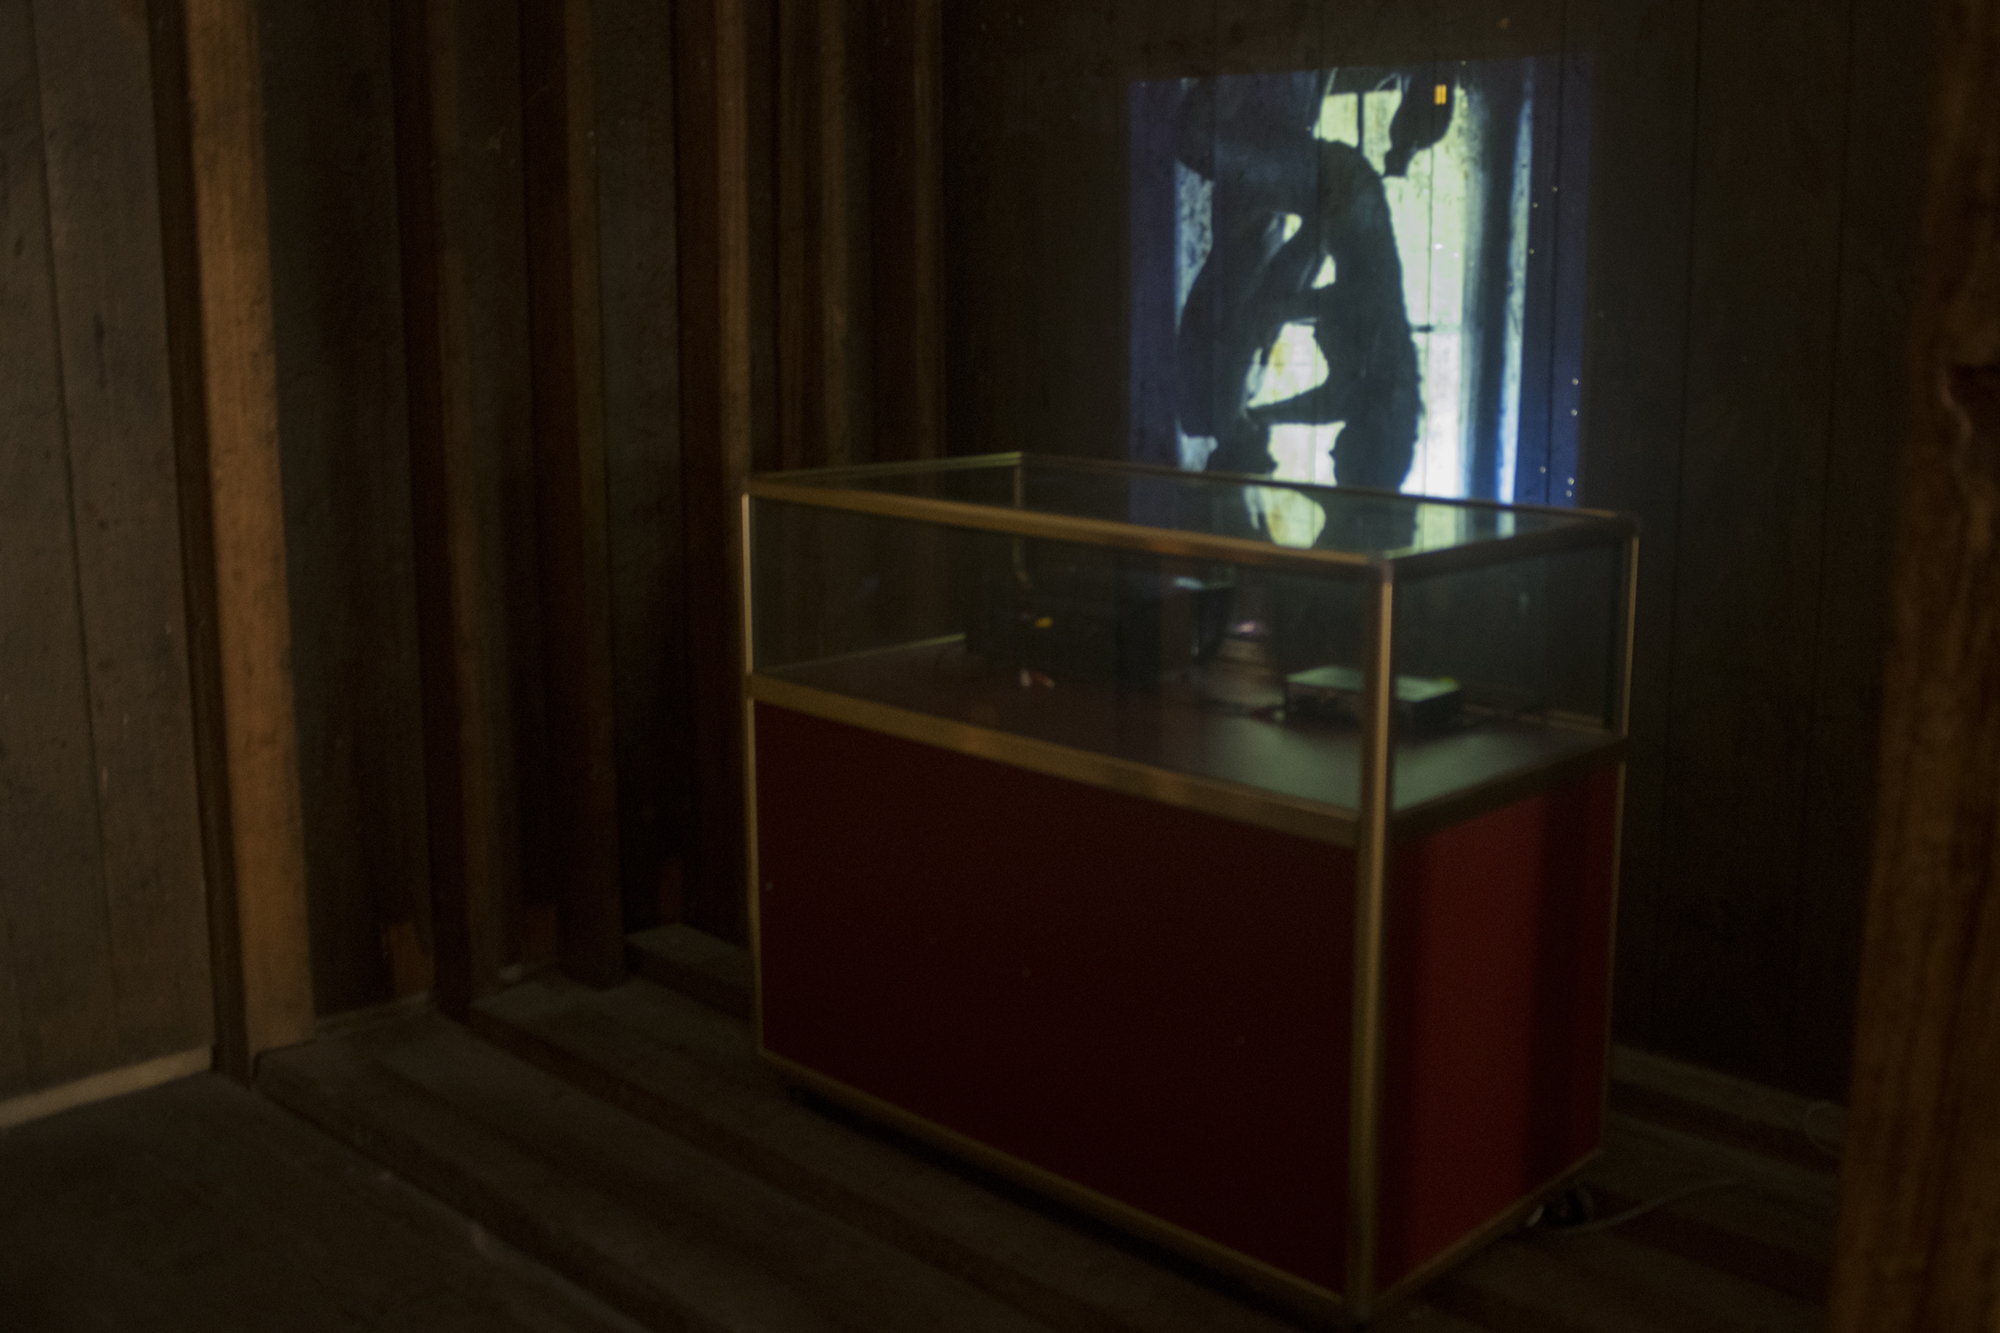 Carolee Schneemann, Fuses, ,16mm film transfer. 18 min.CourtesyElectronic Arts Intermix (EAI), New York. image: Liam James